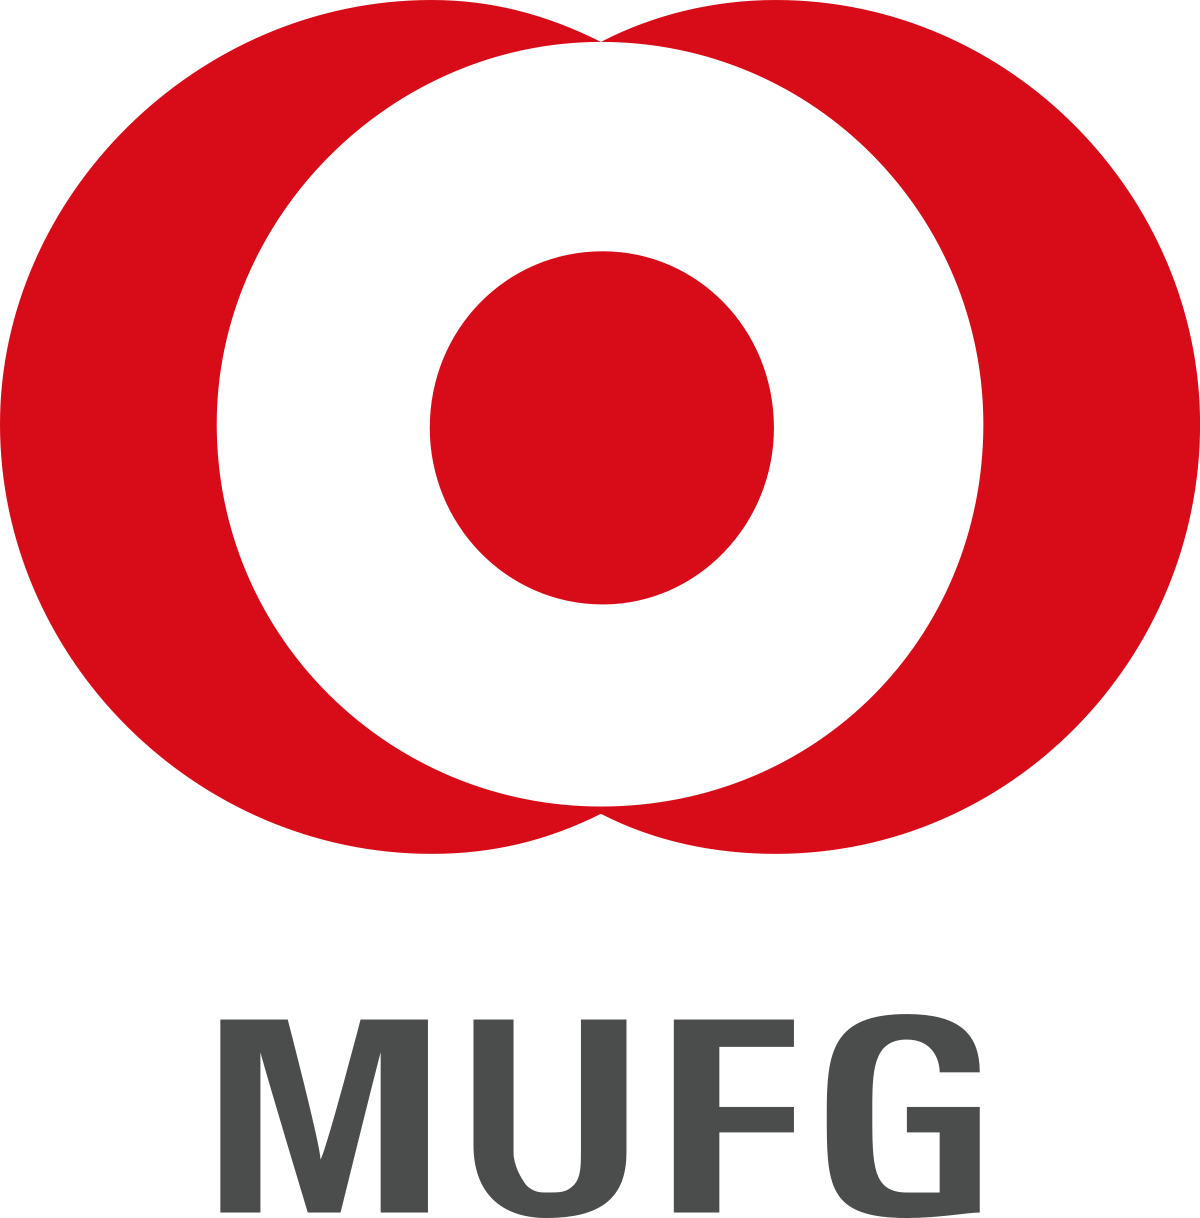 Mitsubishi Ufj Financial Group Inc. 8306 Icon Logo